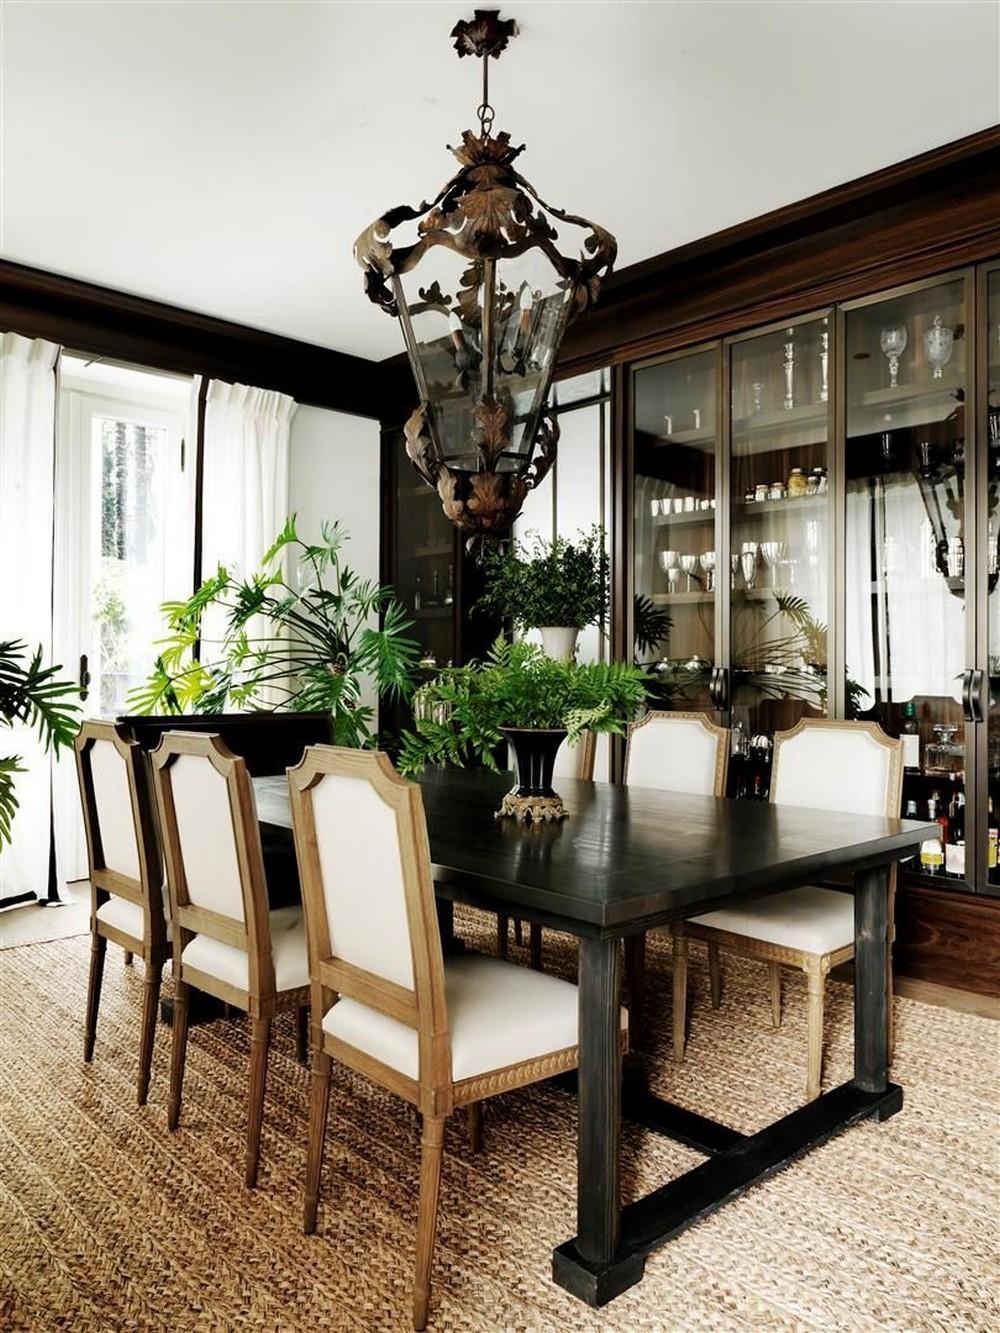 Interior Design The Art of Living à Française by Gilles & Boissier_11